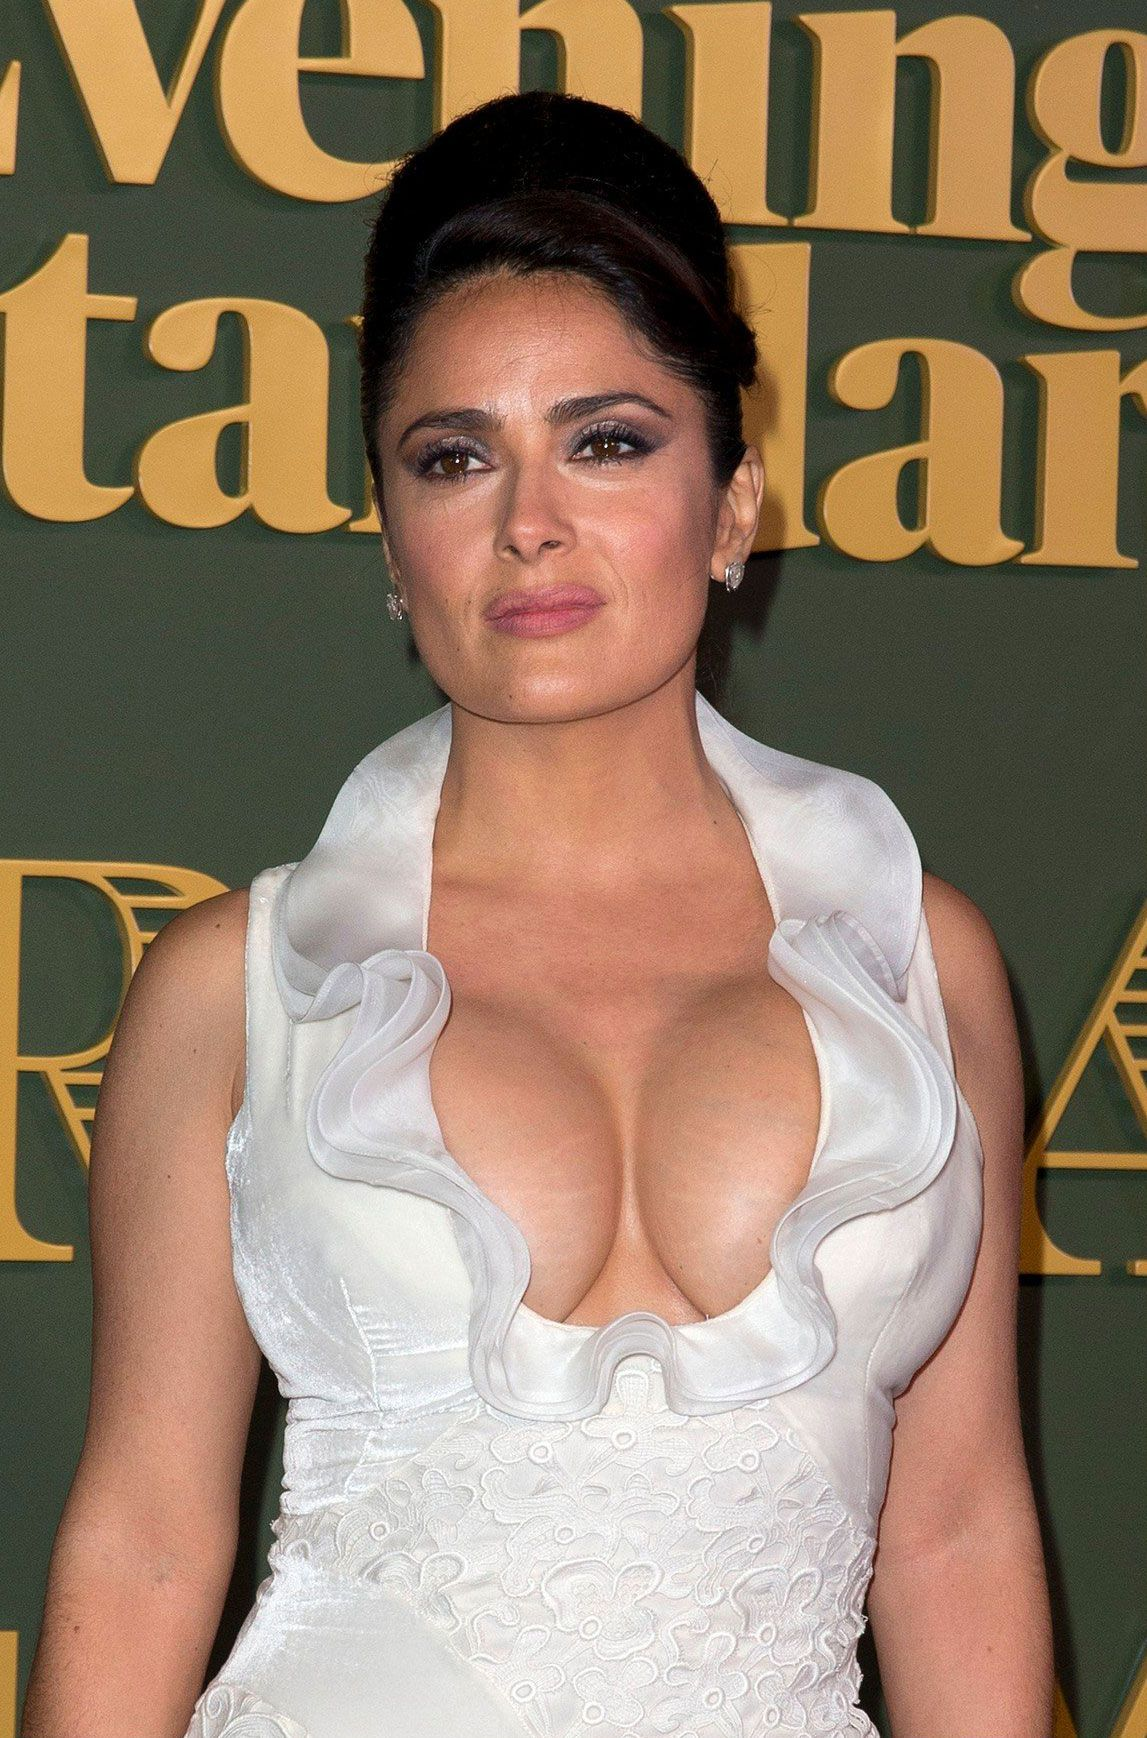 woman-with-salma-hayek-hot-cumming-kapoor